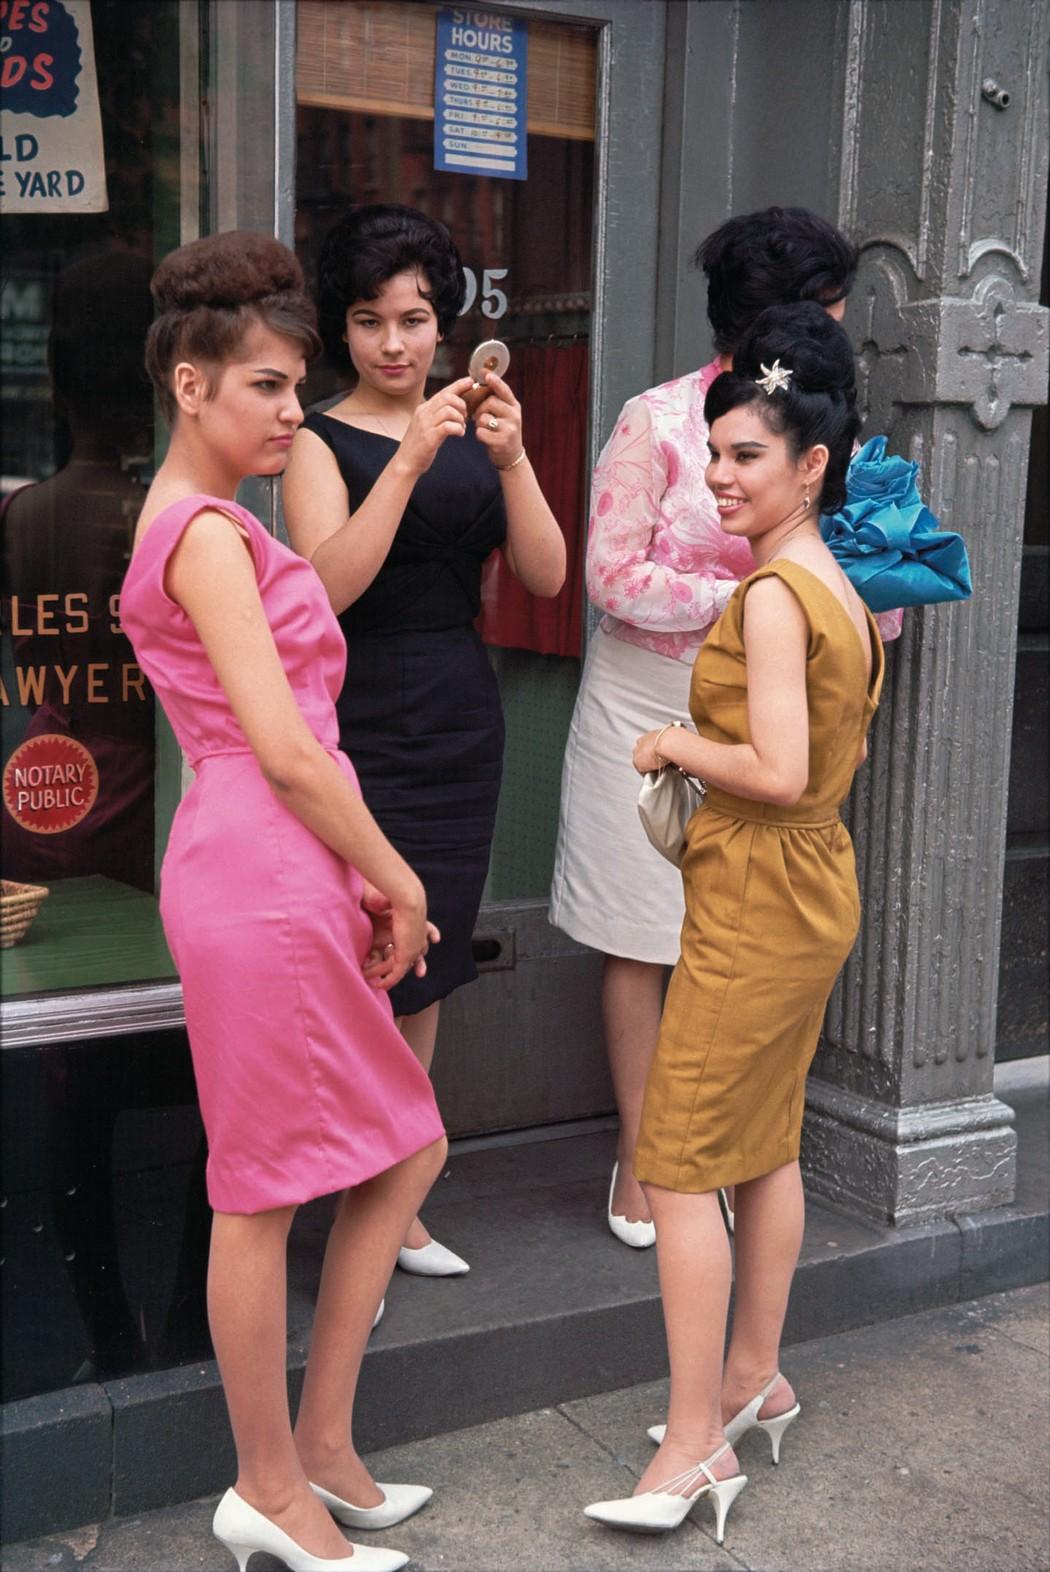 1513633038065-08_new_york_city_1963_lr